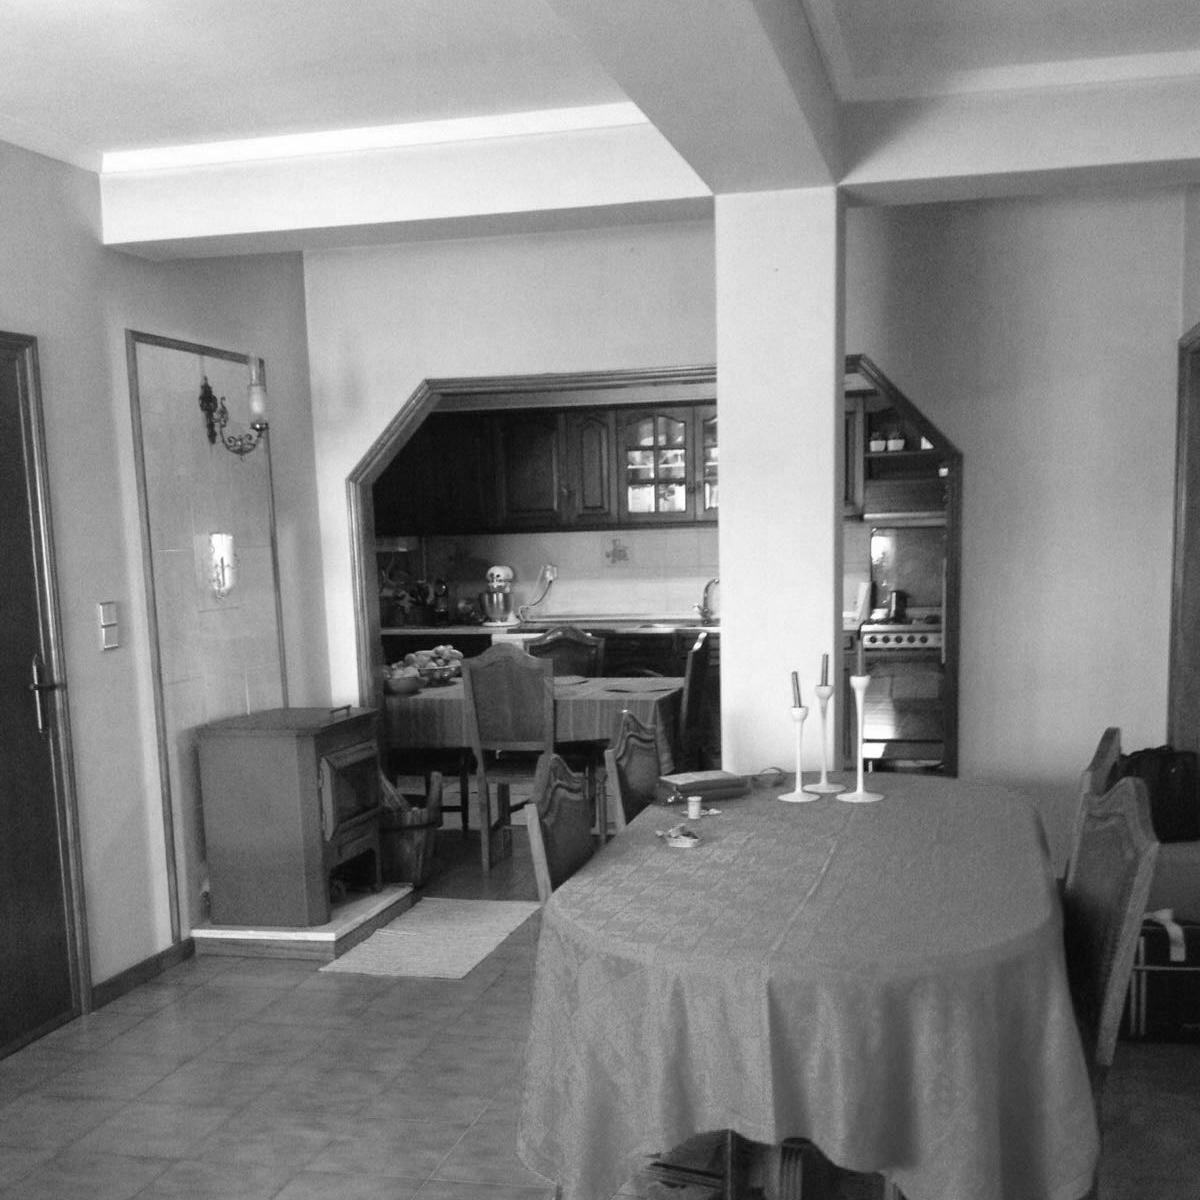 apartamentoRP_antes_01.jpg